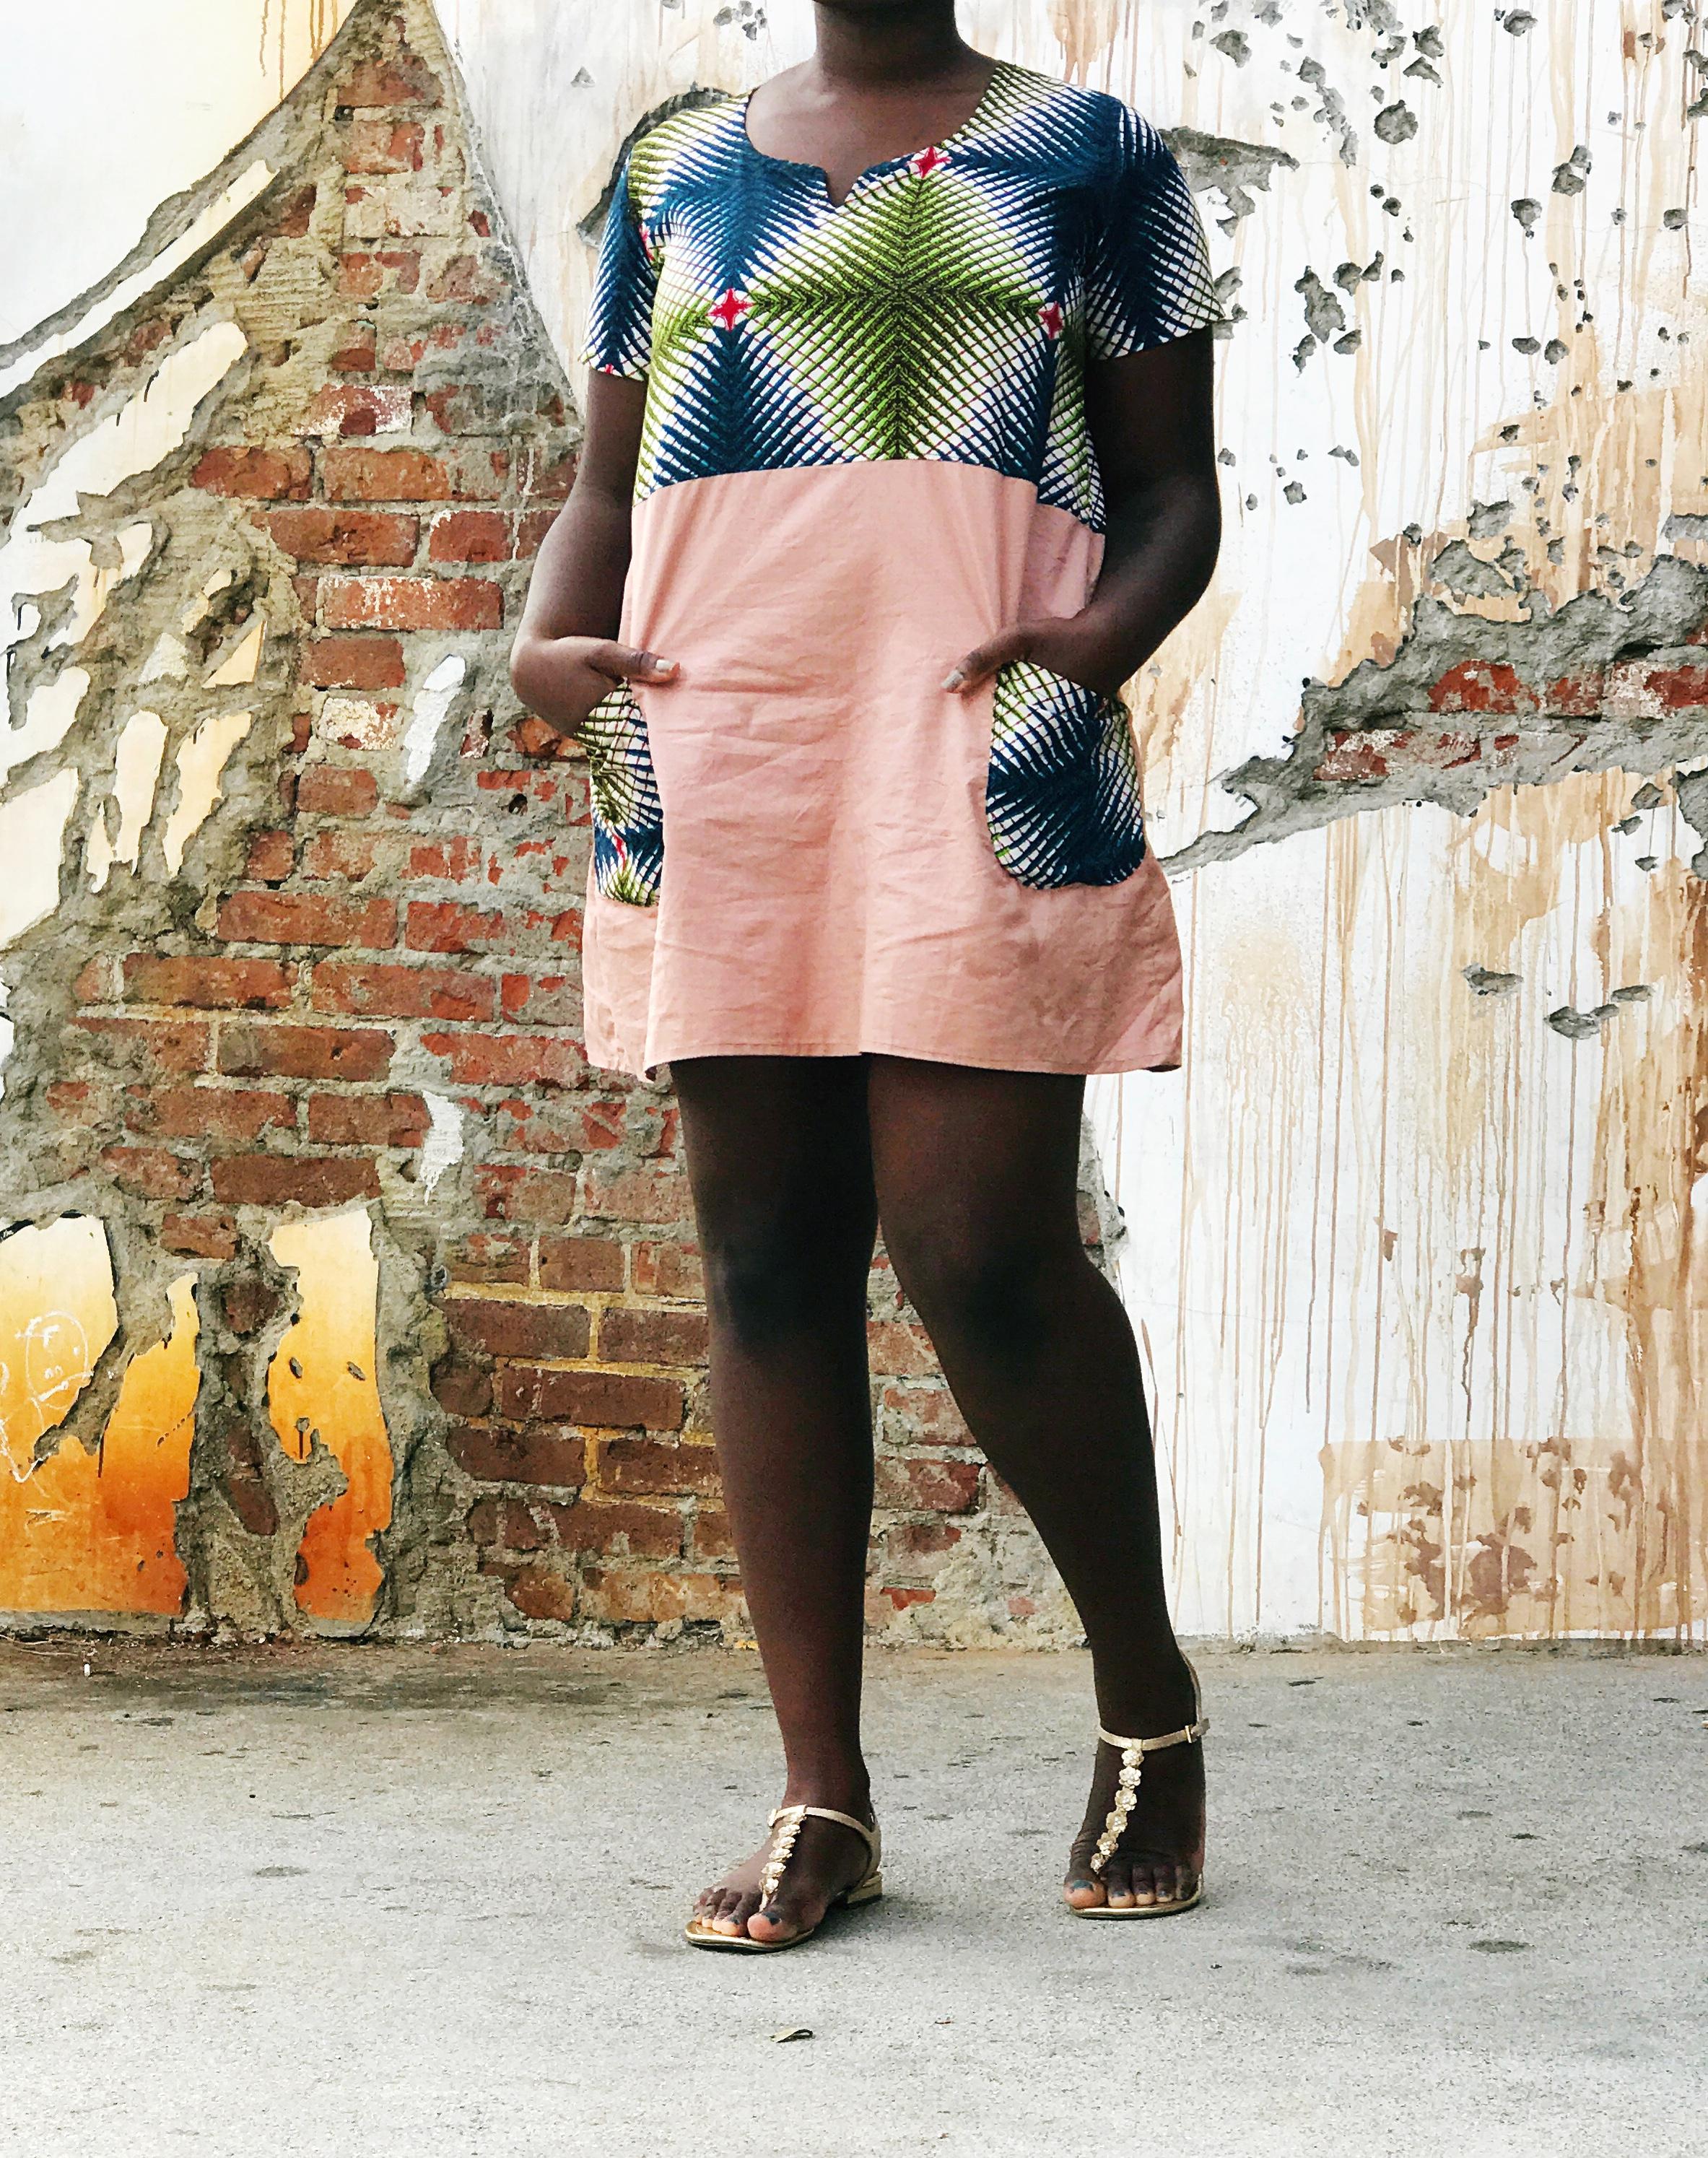 Black woman wearing pink and ankara dress and gold sandals.